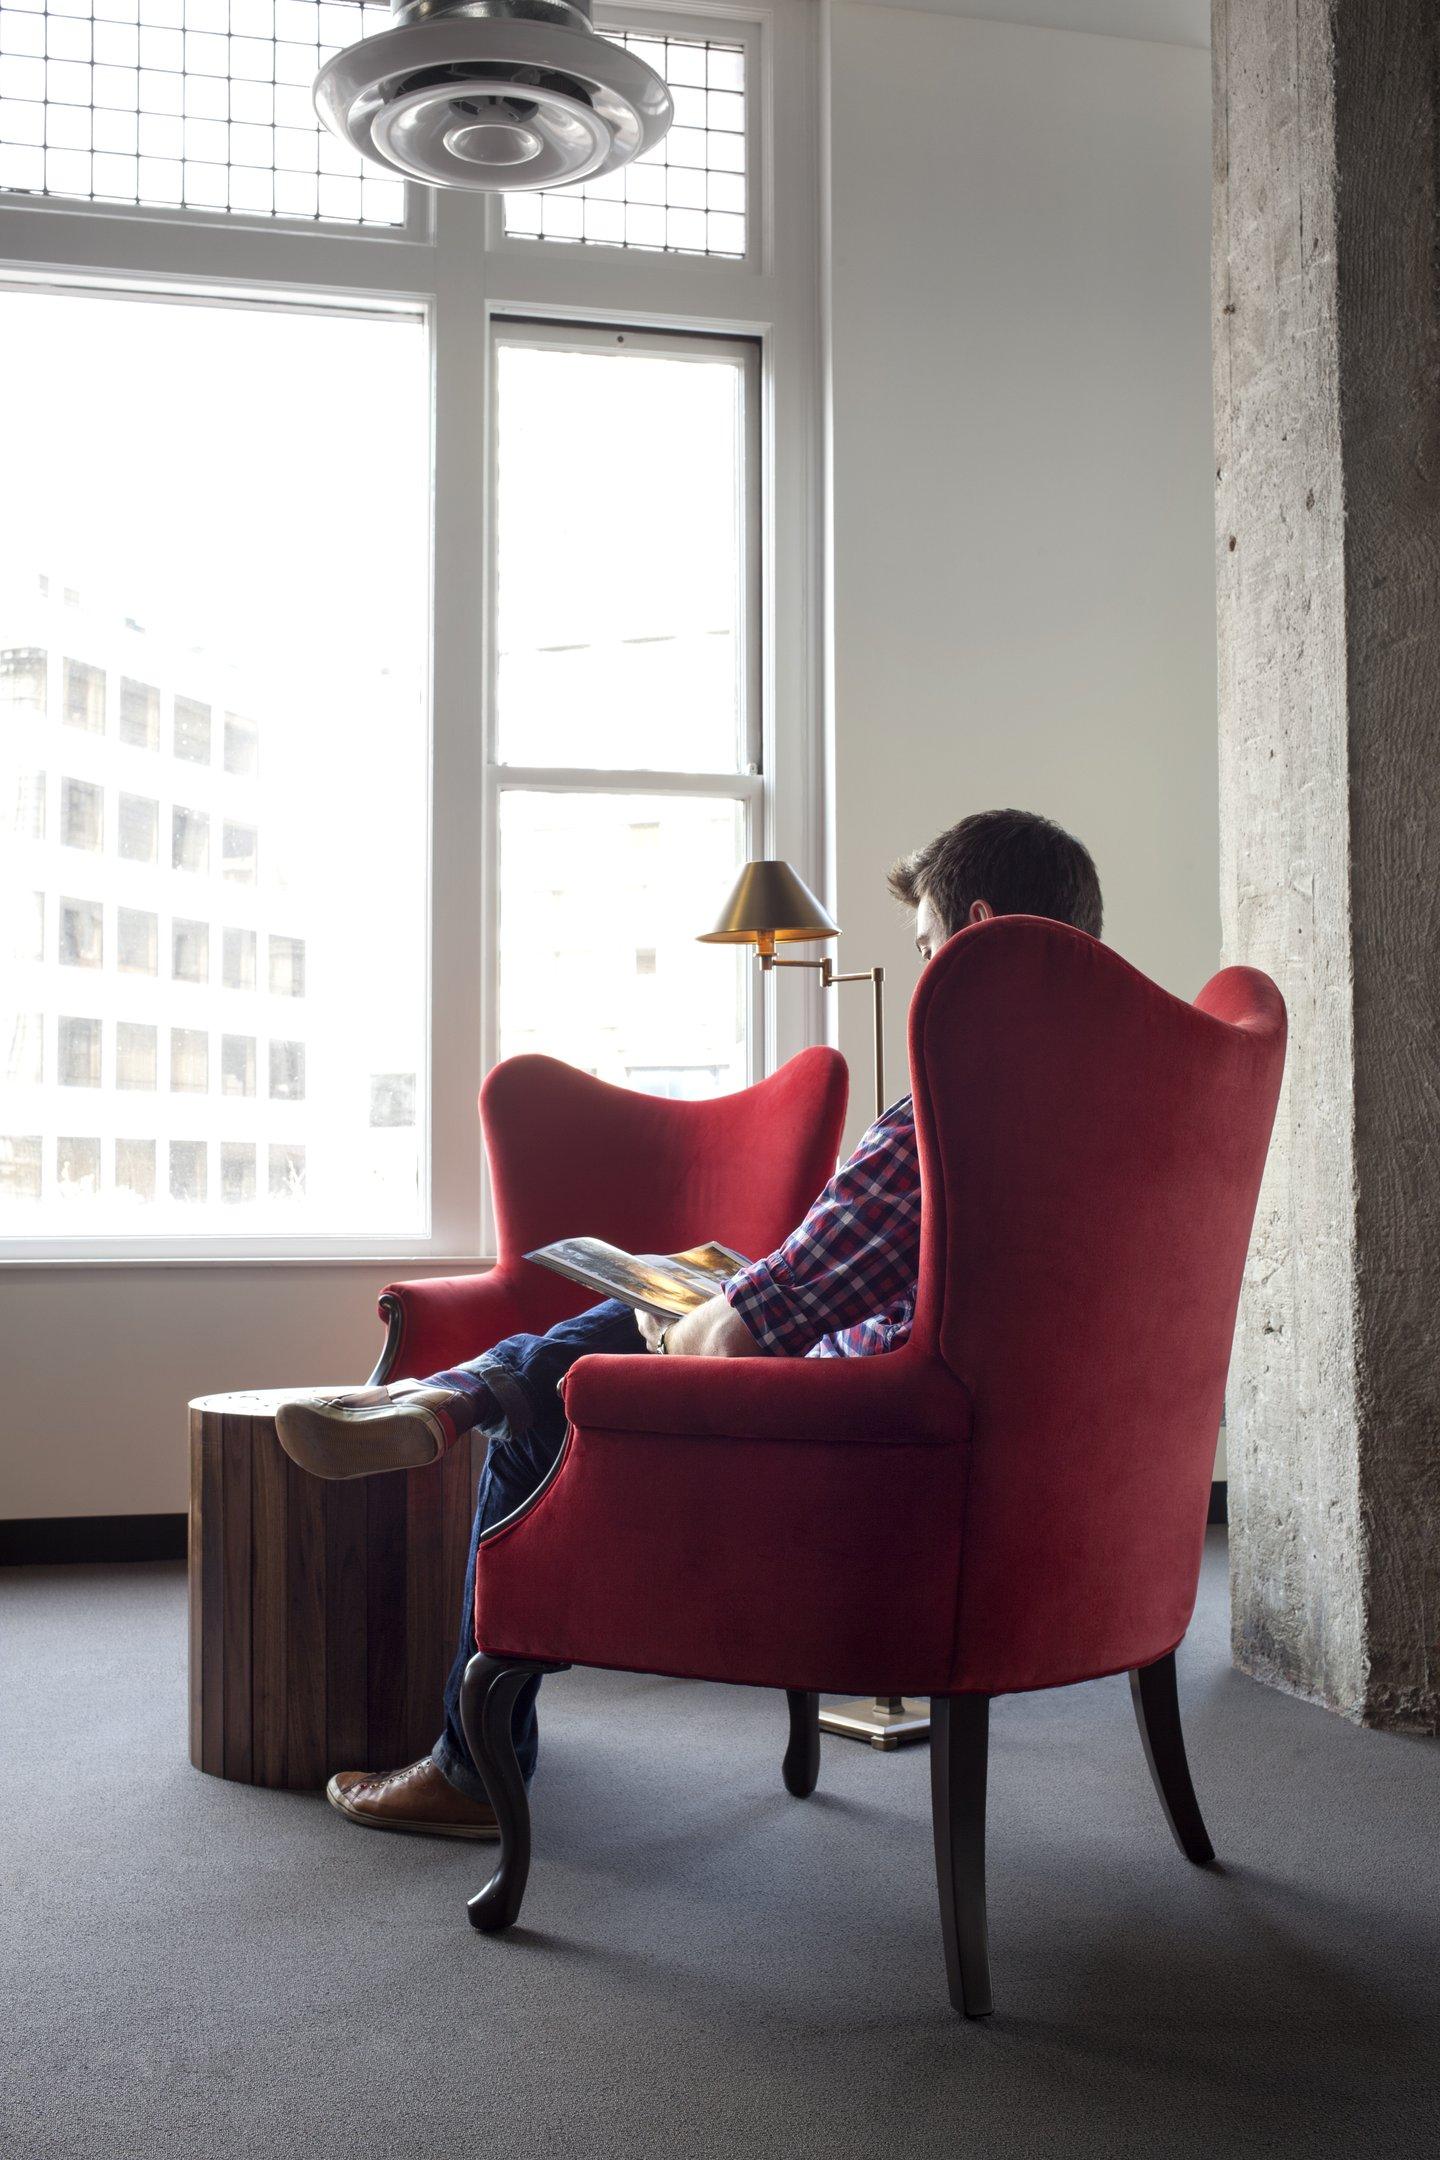 Phone room office space photos custom spaces - Hotel Tonight